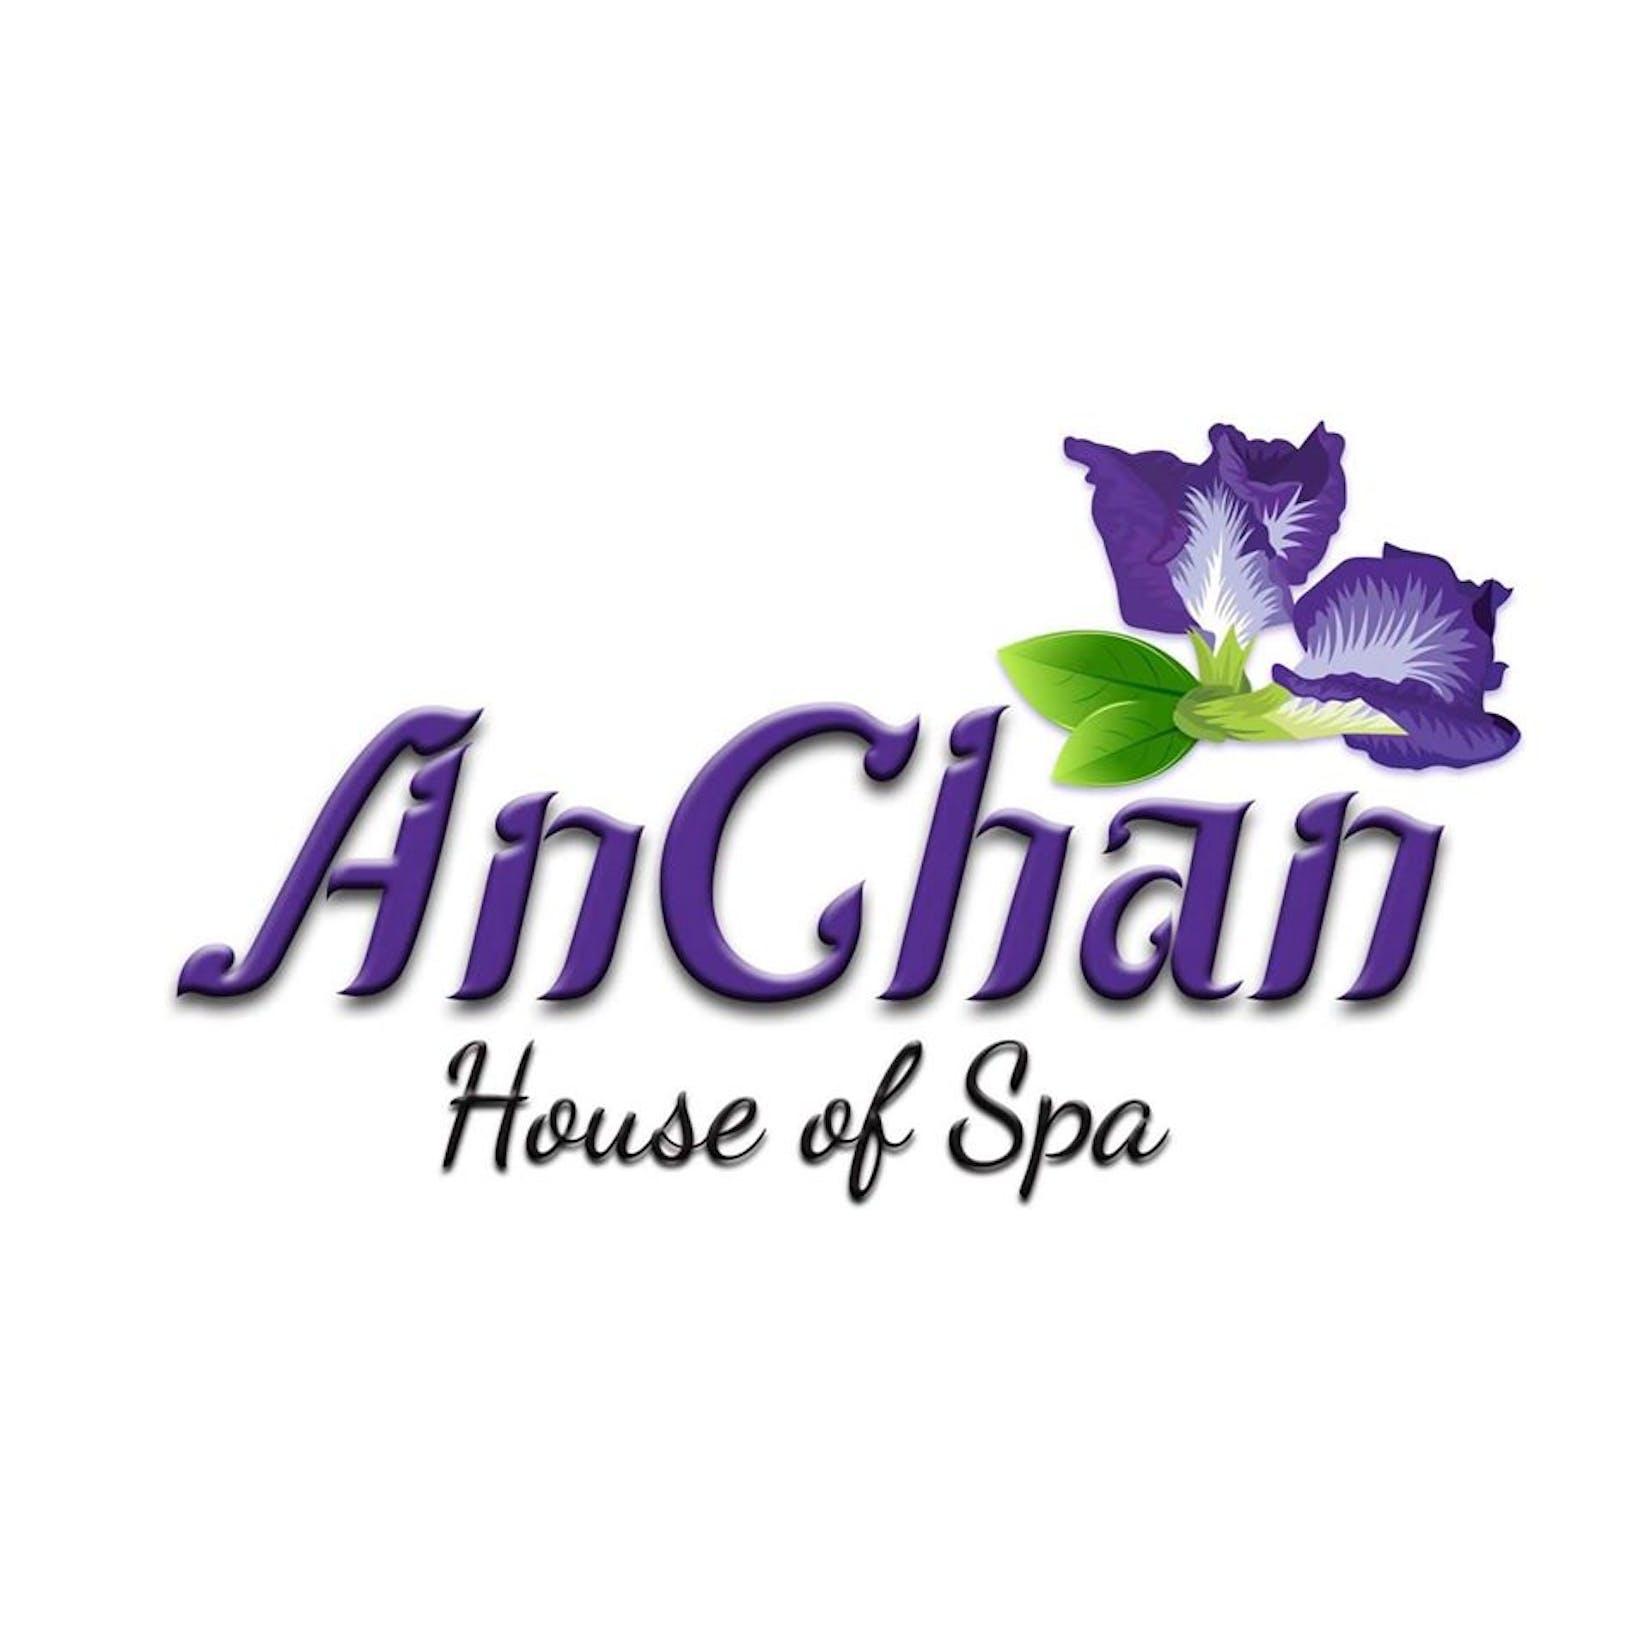 AnChan House of Spa | Beauty